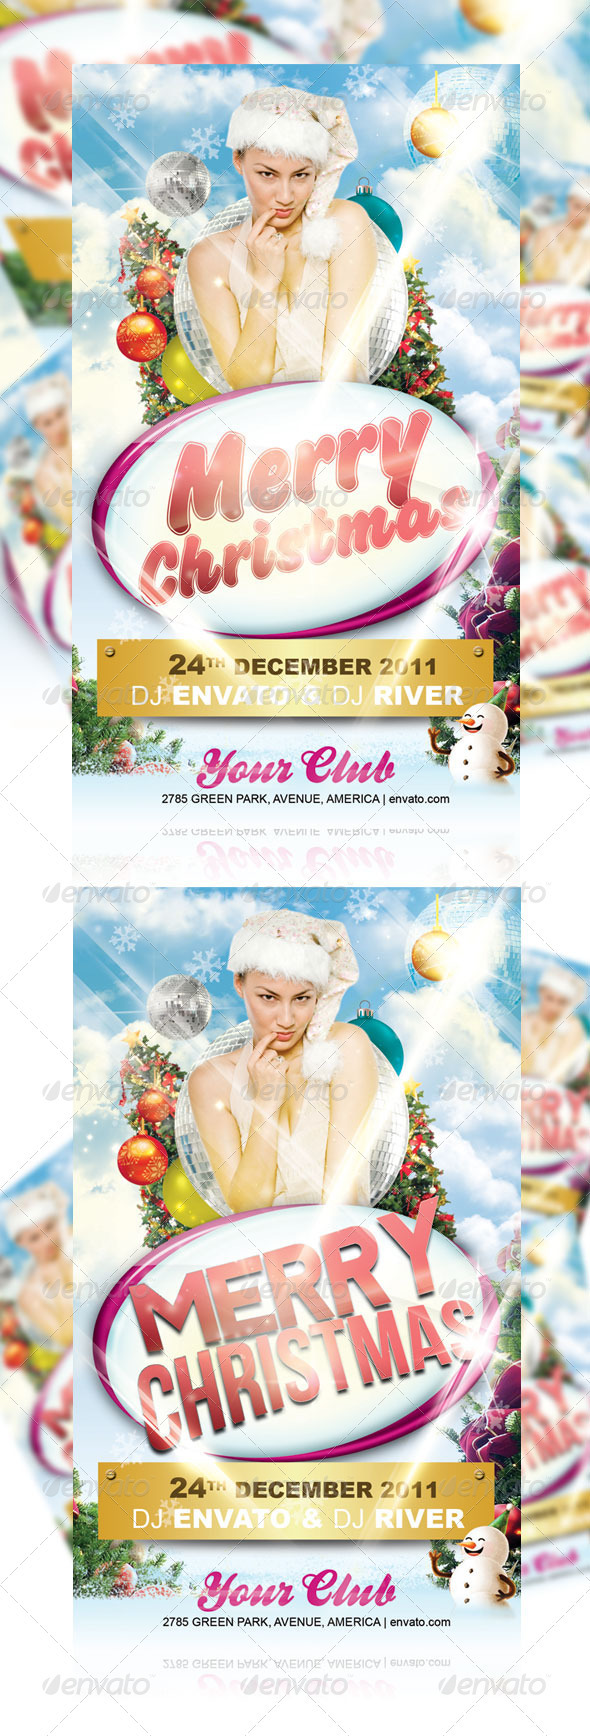 GraphicRiver Merry Christmas Flyer Ver1 762183